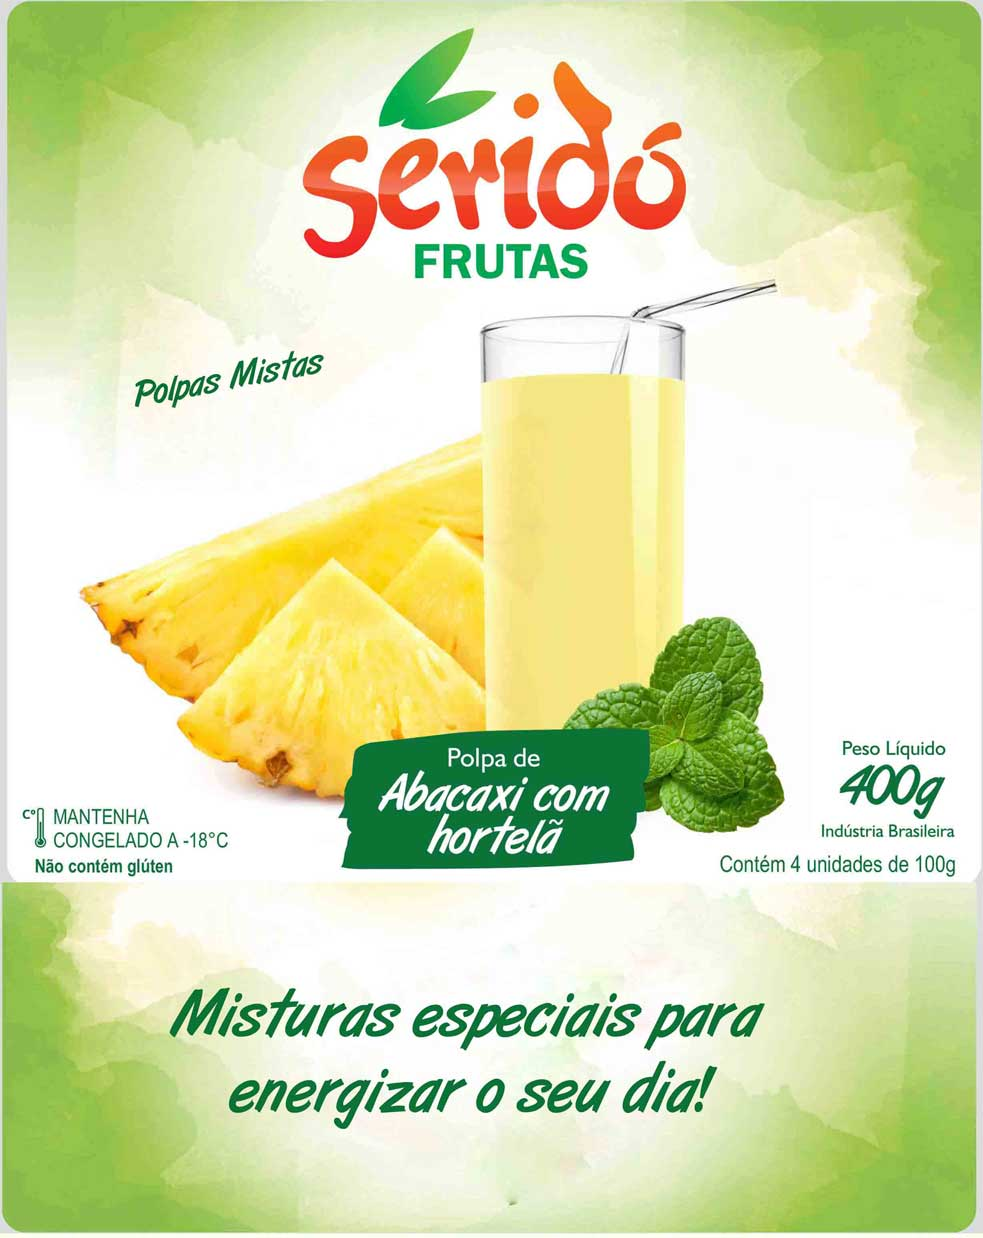 Polpa Abacaxi com Hortelã - Polpa Mista